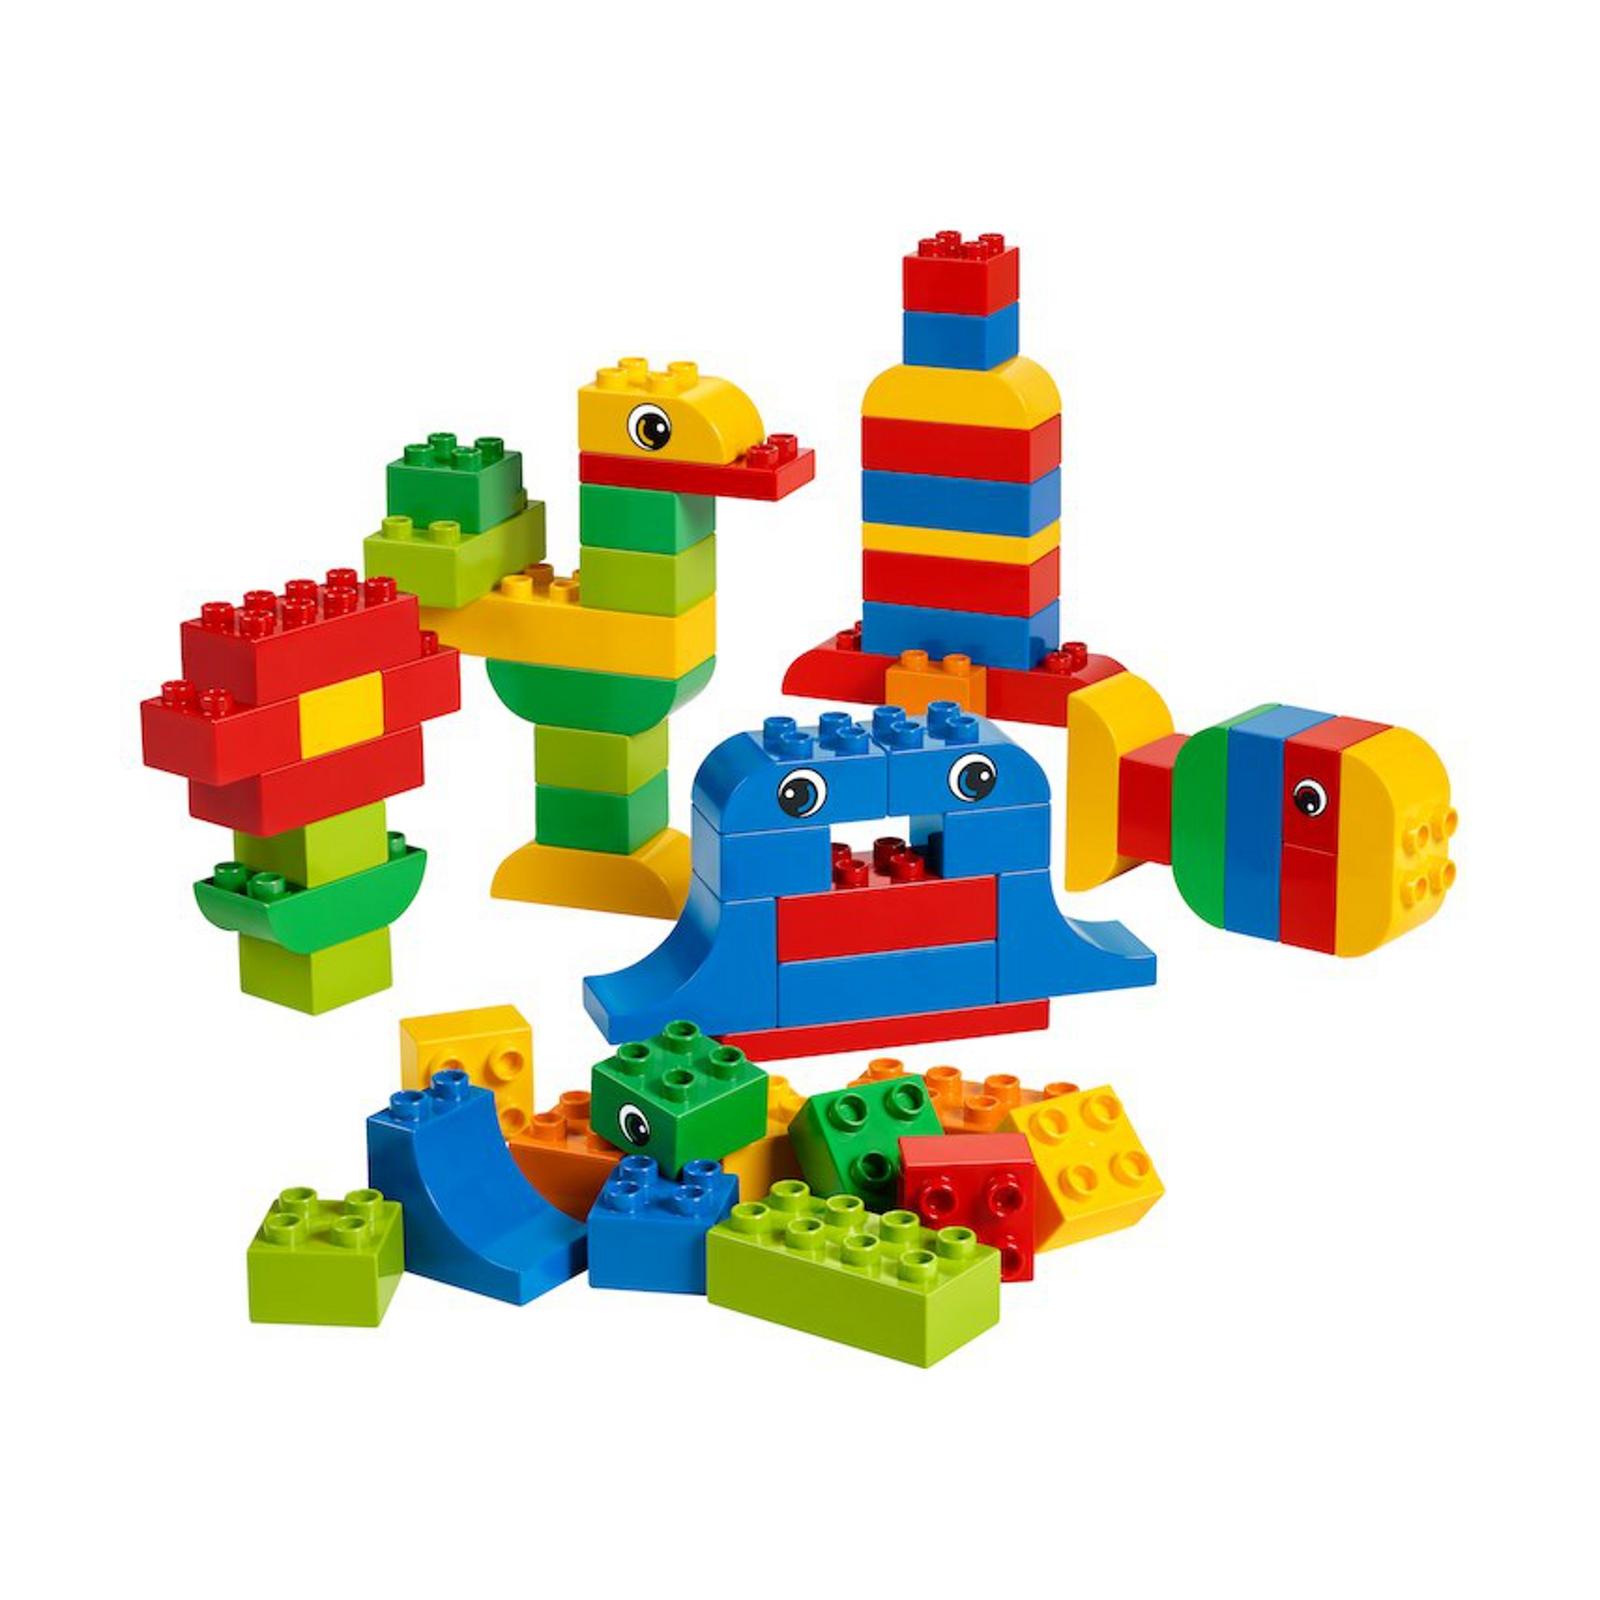 Craft Equipment For Children